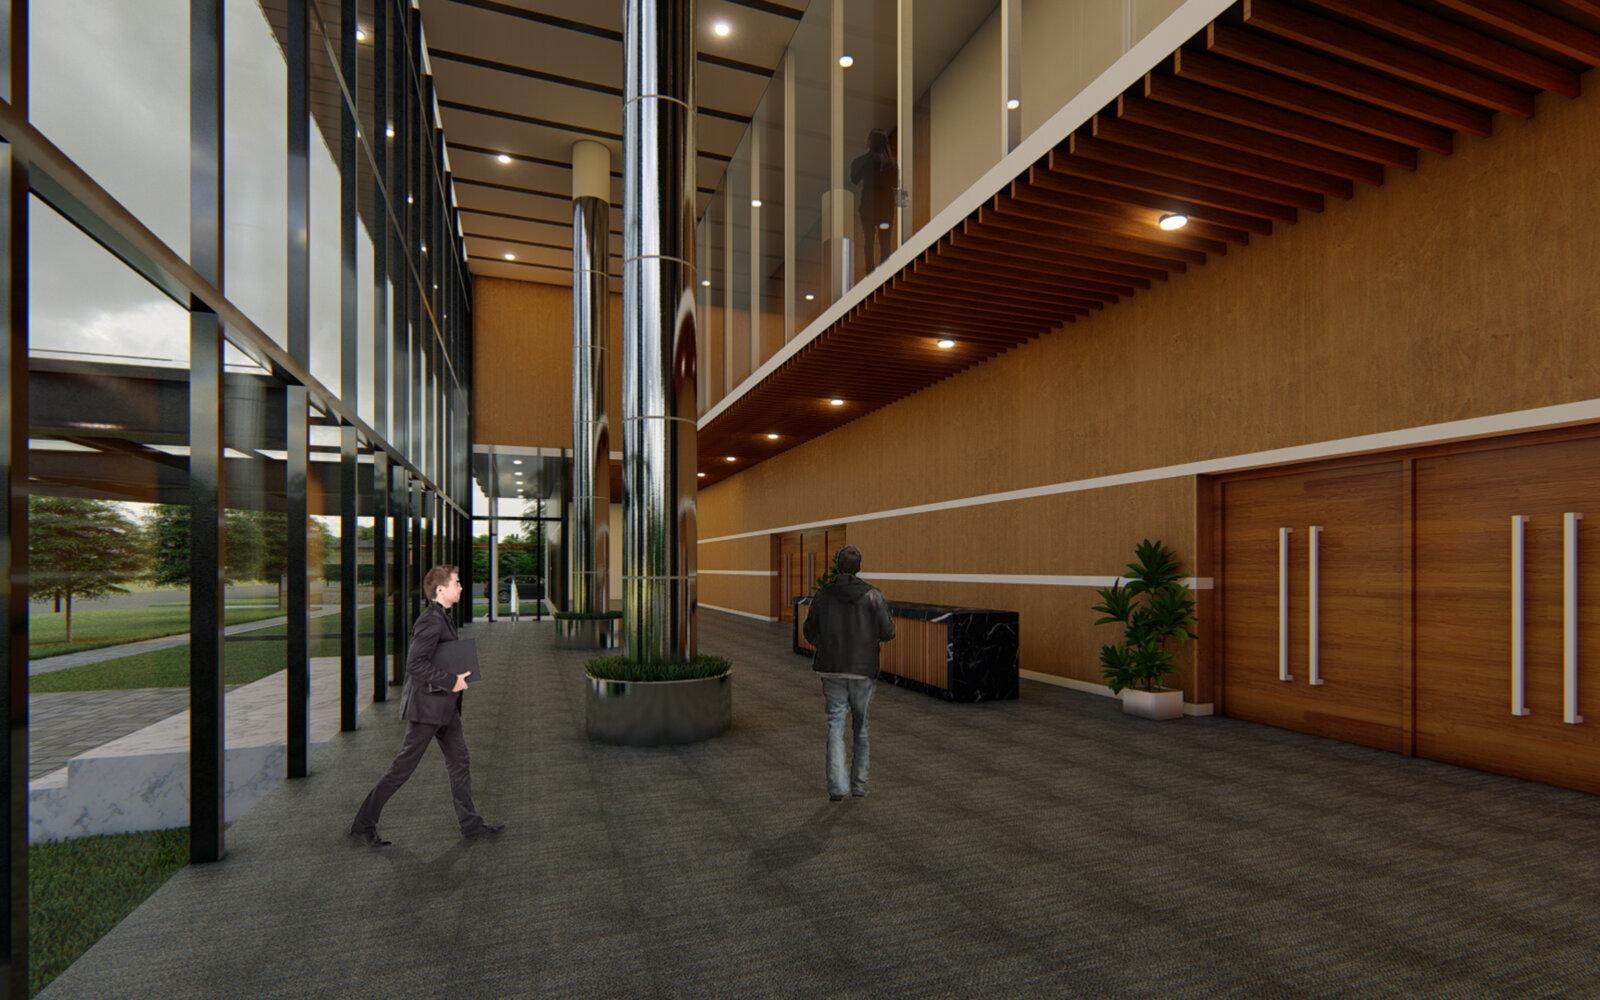 LCB Convention Centre Lucknow Cantonment Board internal CGI